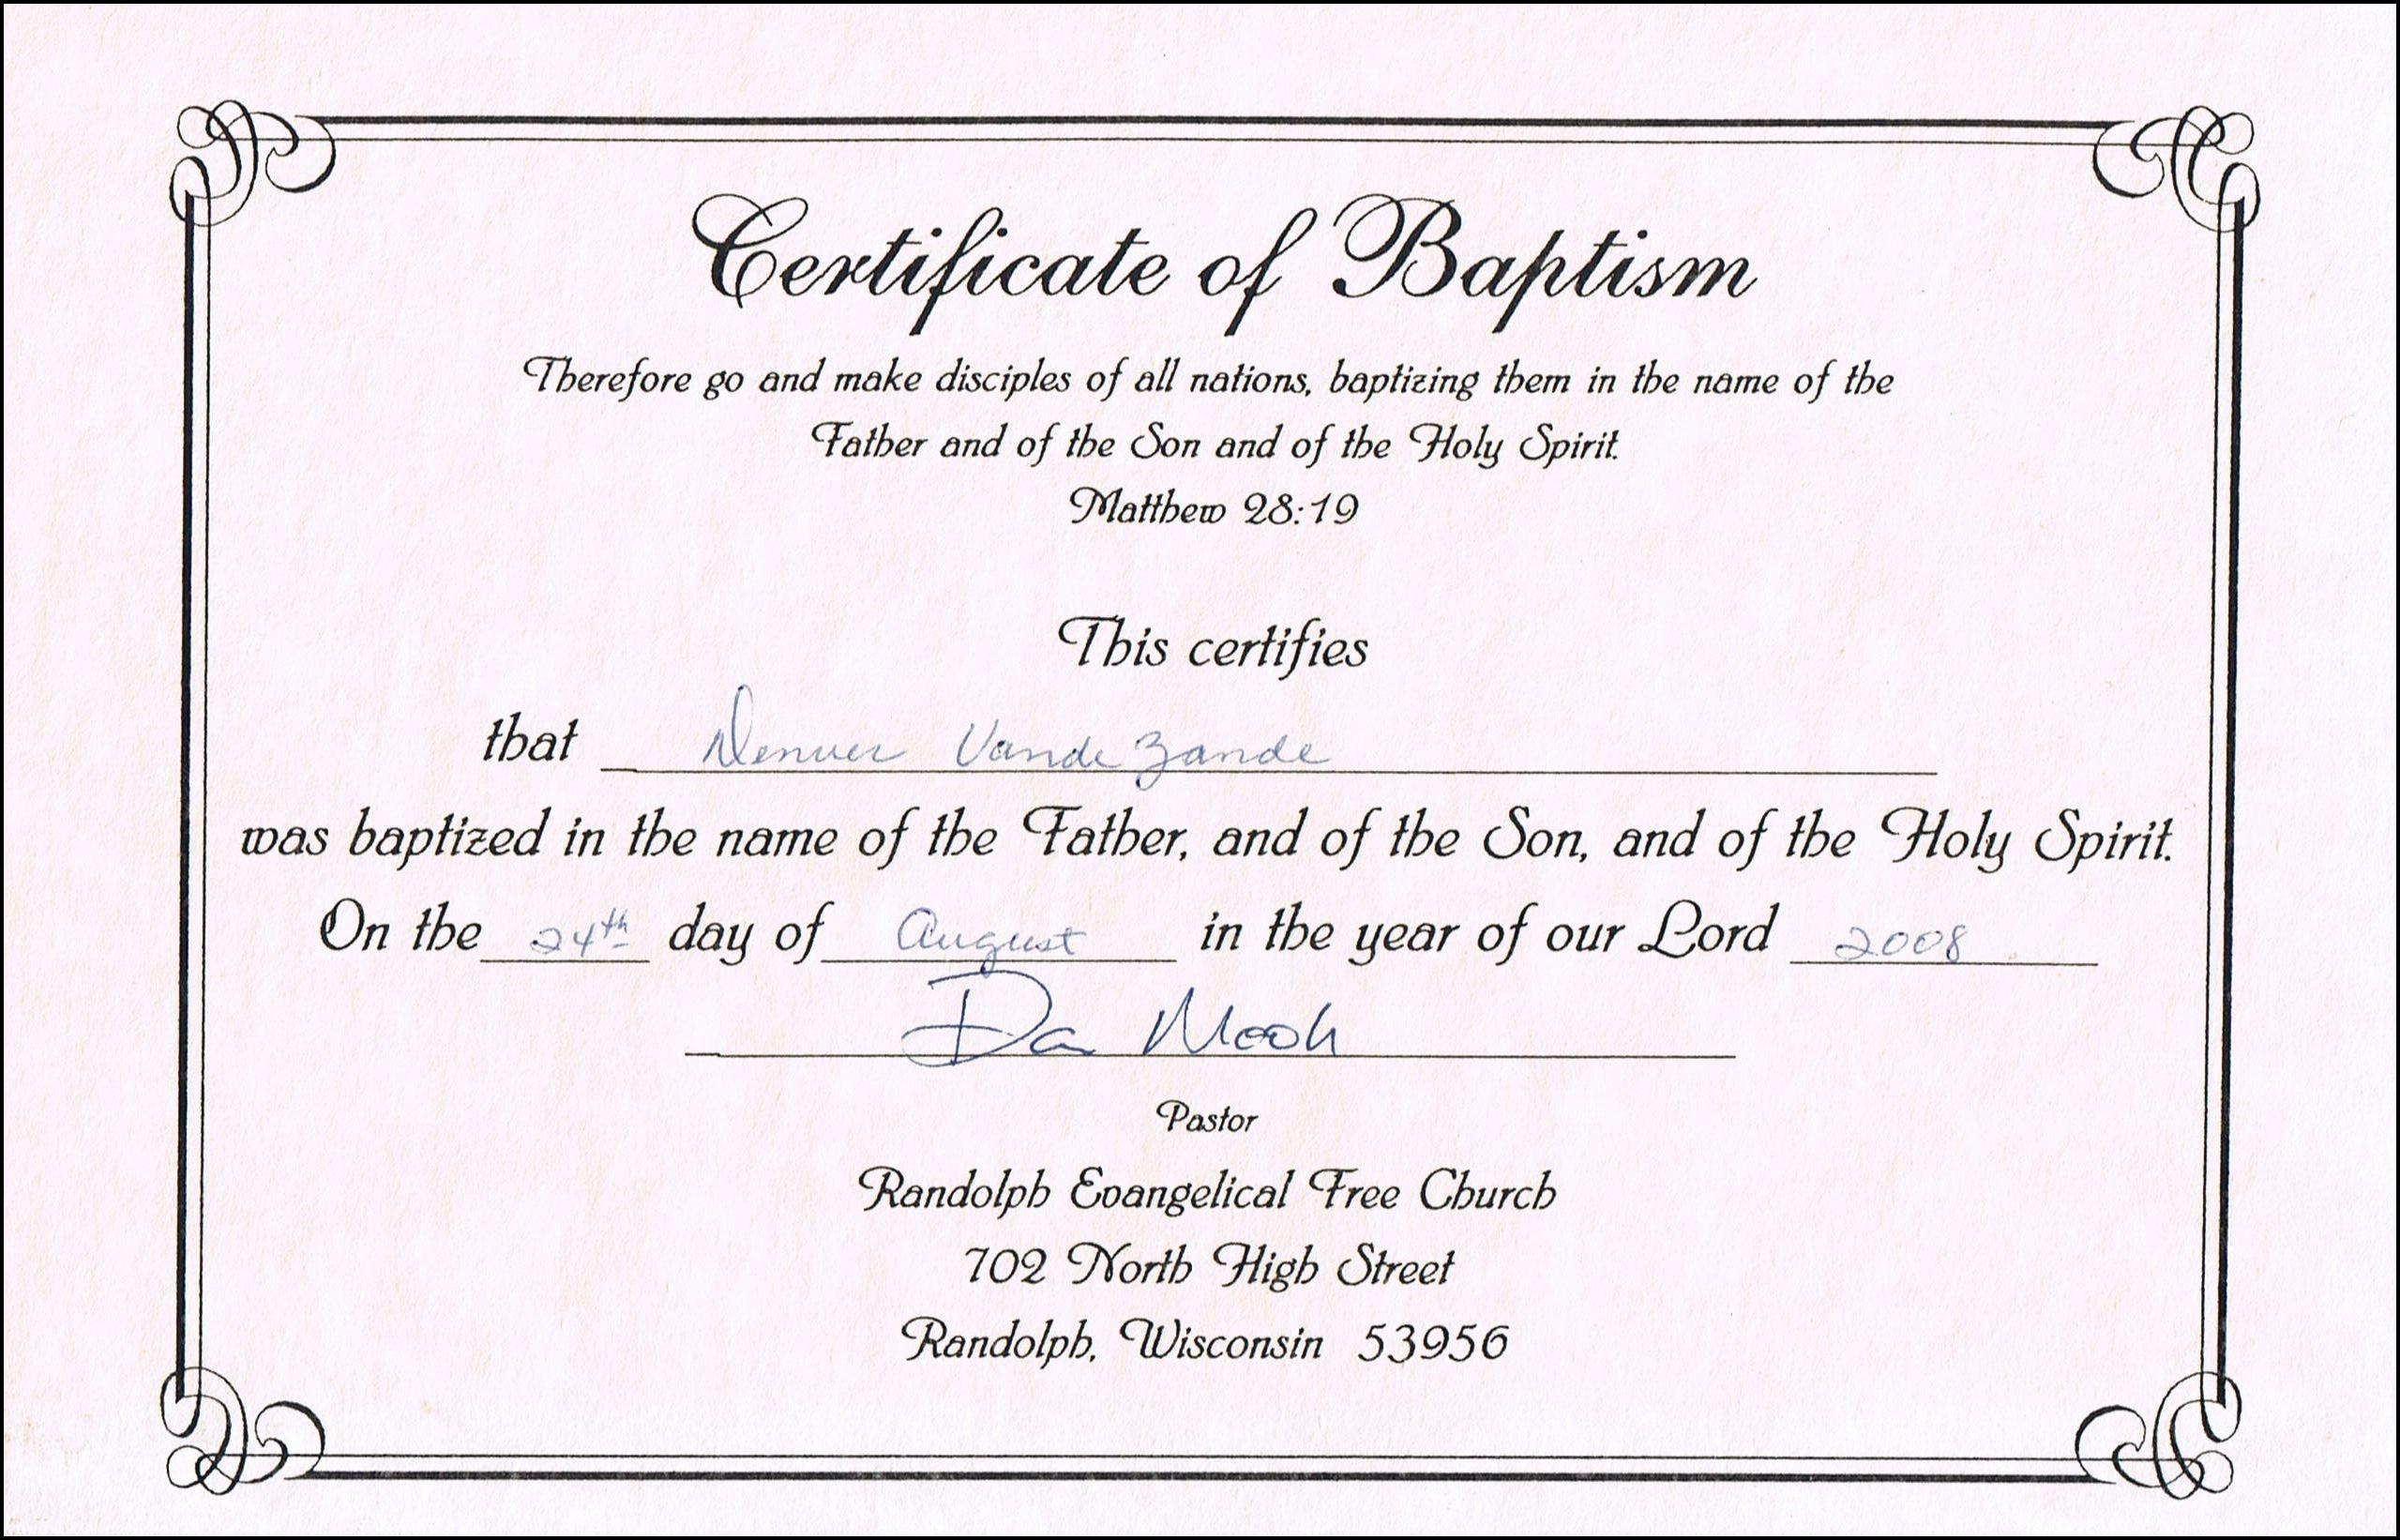 Free Baptism Certificate Template Word Elegant Baptism Certificate Templates for Word